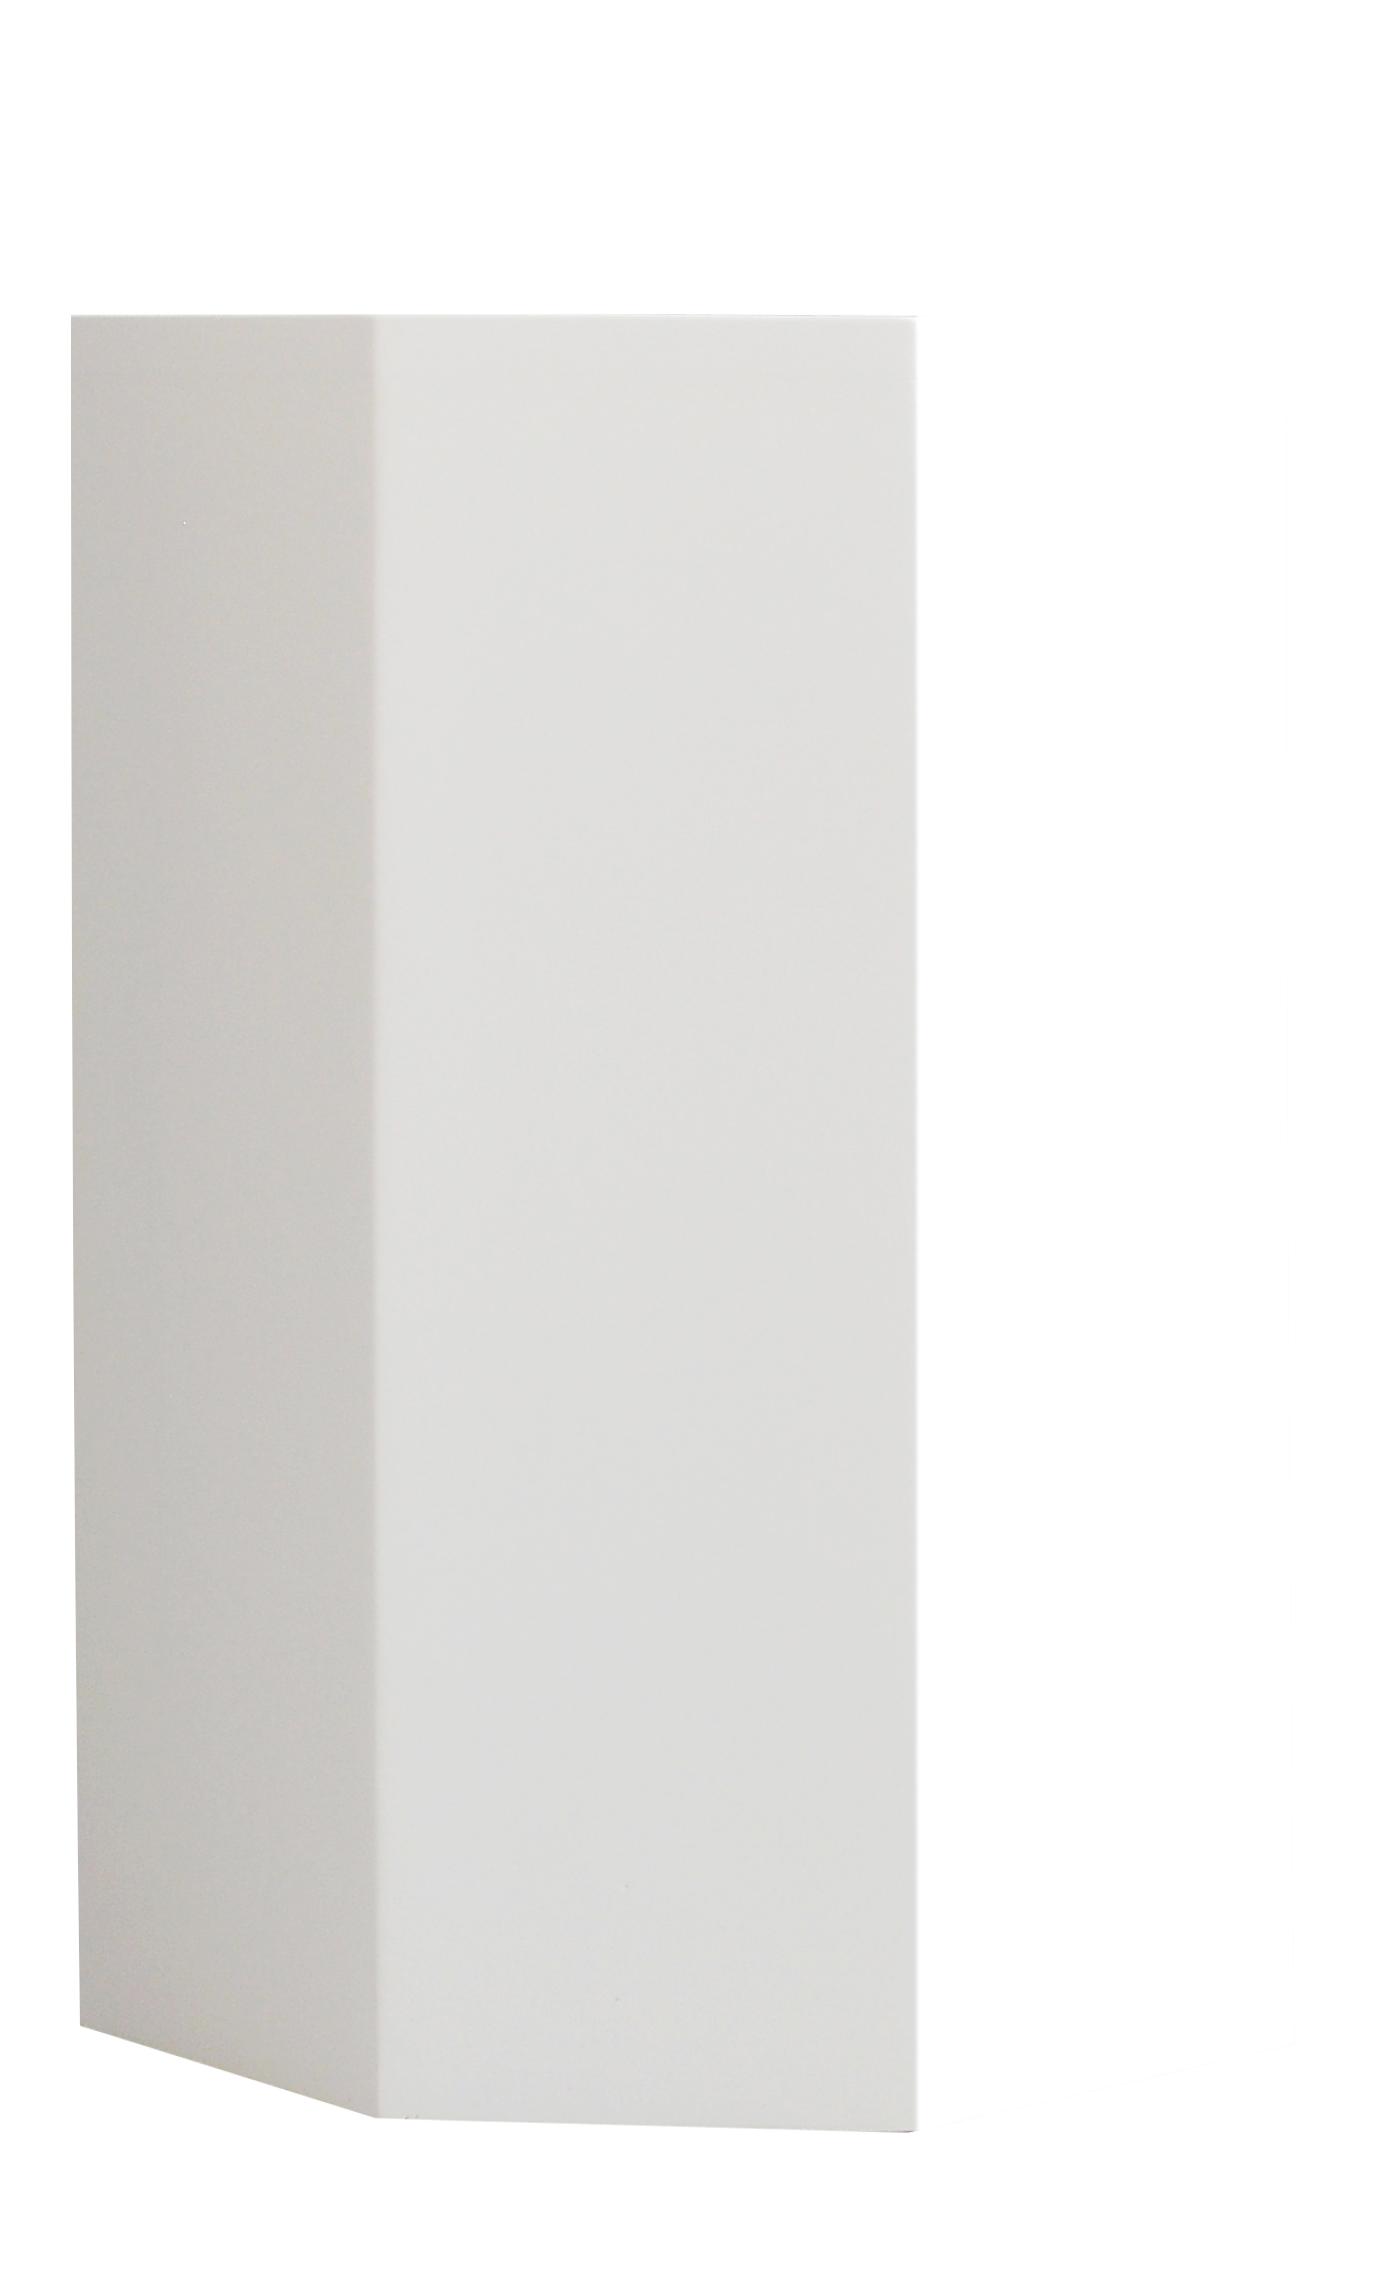 octo white-emnastudio